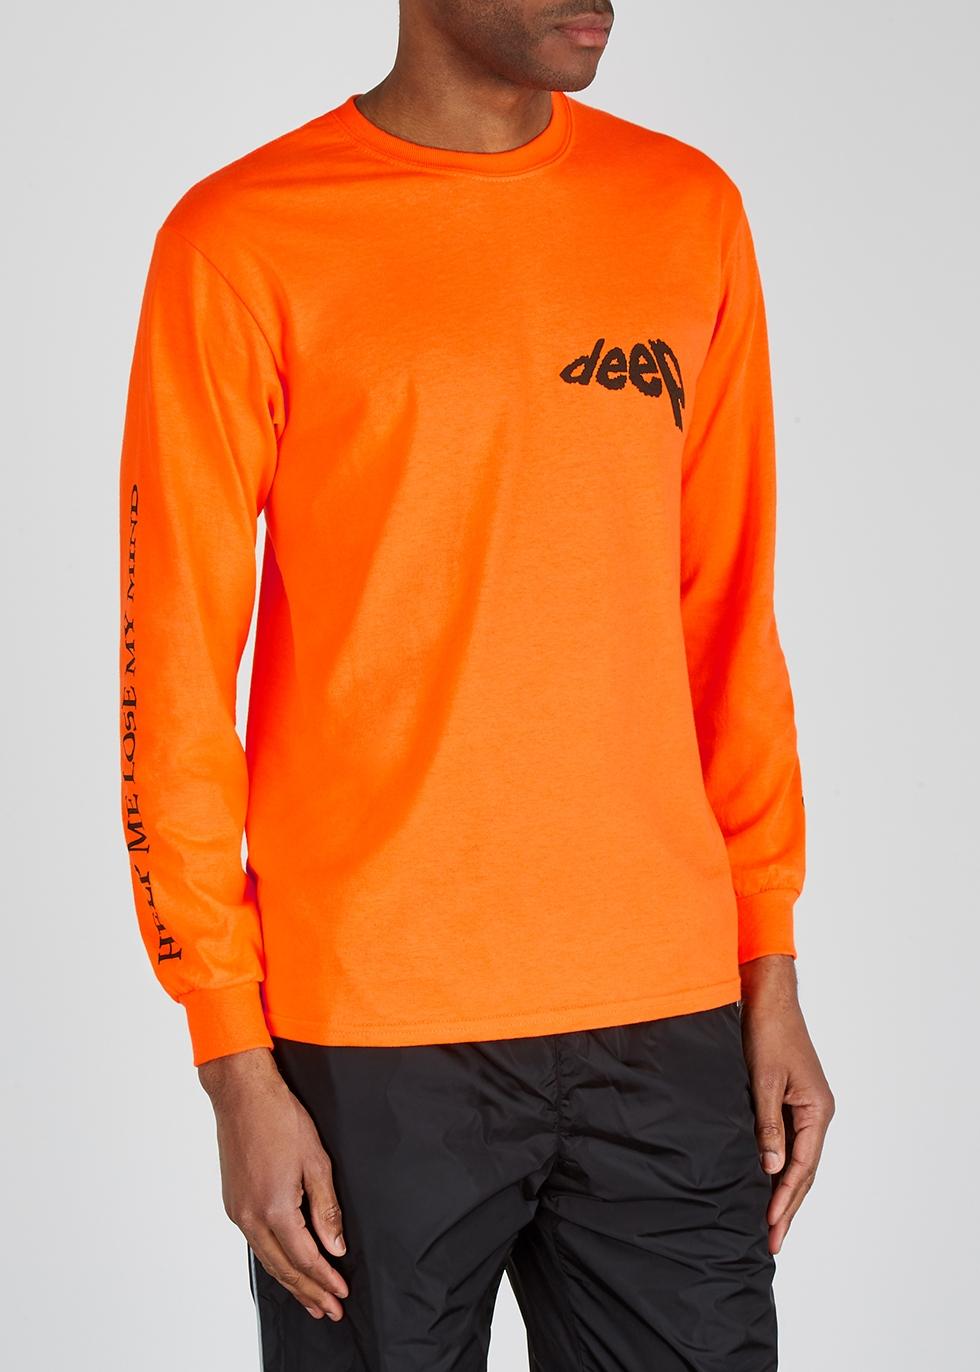 Neon-orange cotton T-shirt - Darkoveli